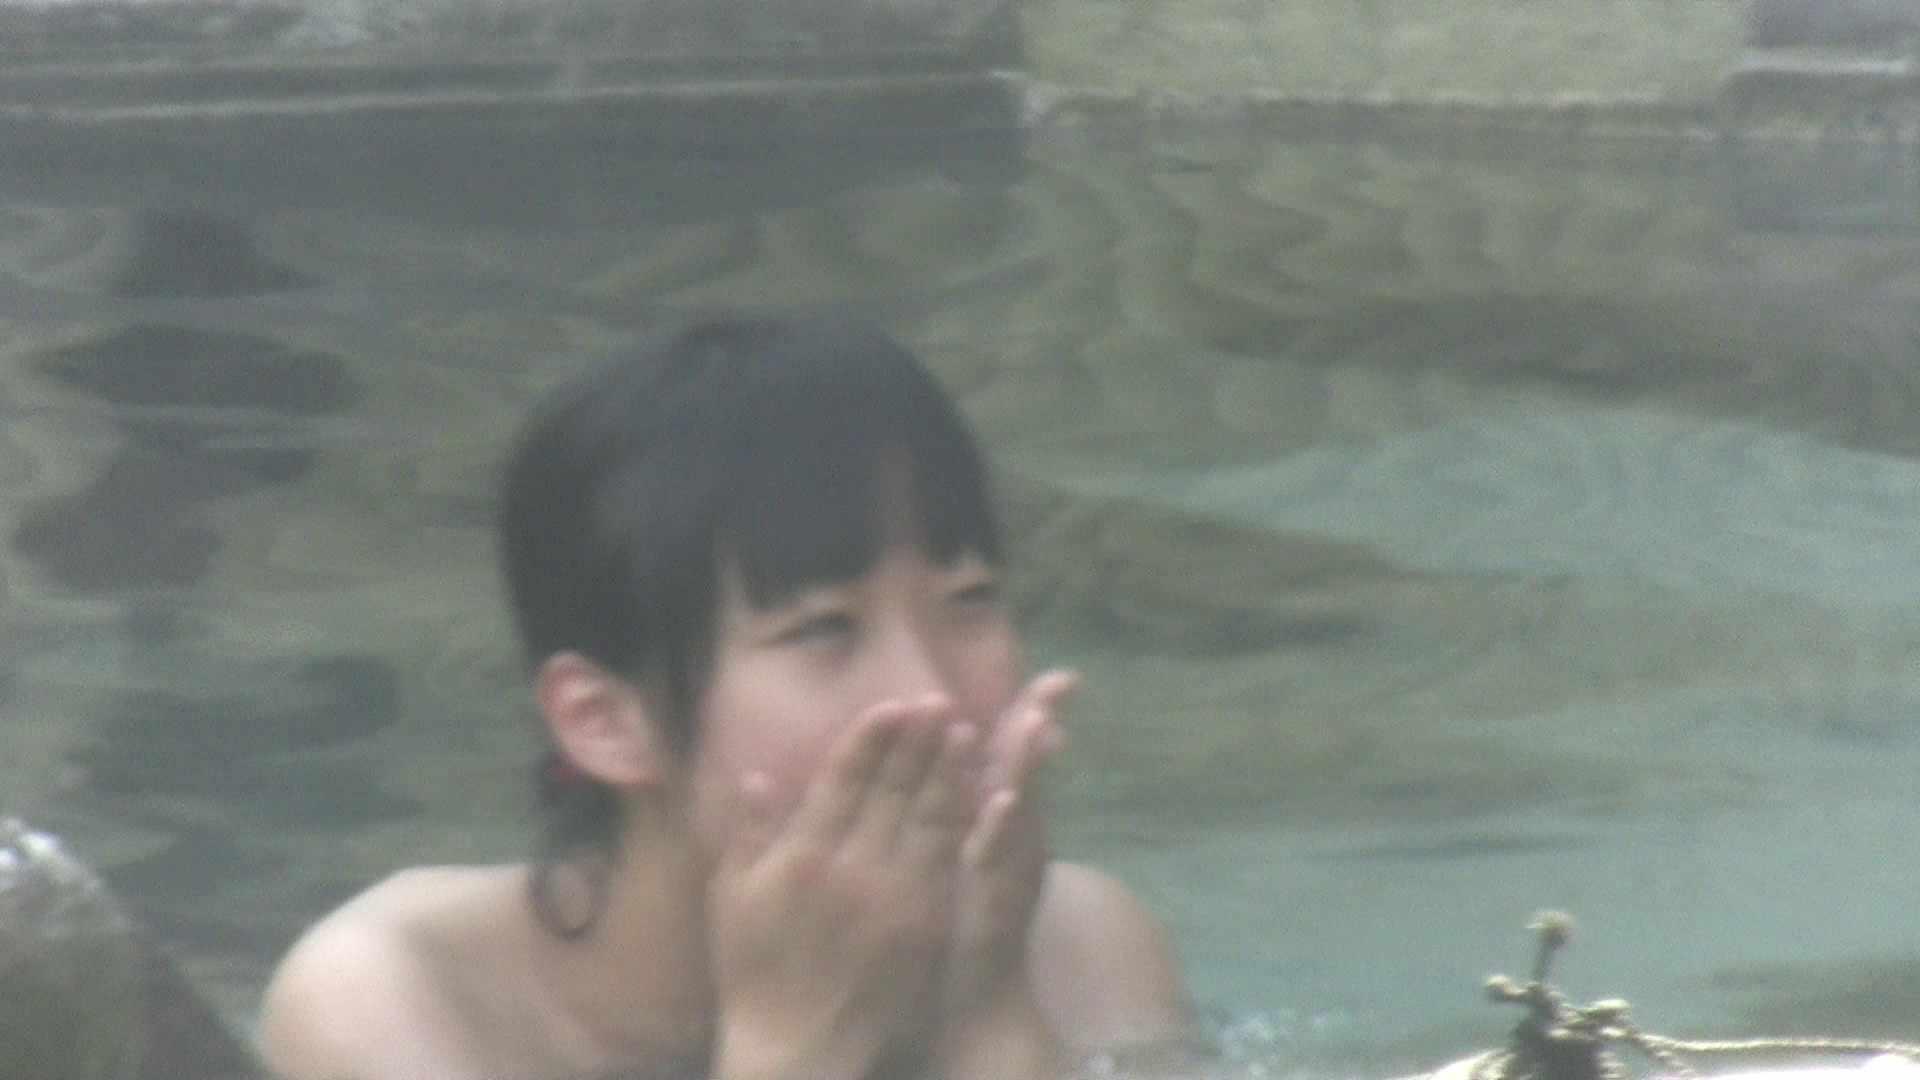 Aquaな露天風呂Vol.196 露天風呂突入 オマンコ無修正動画無料 72pic 50